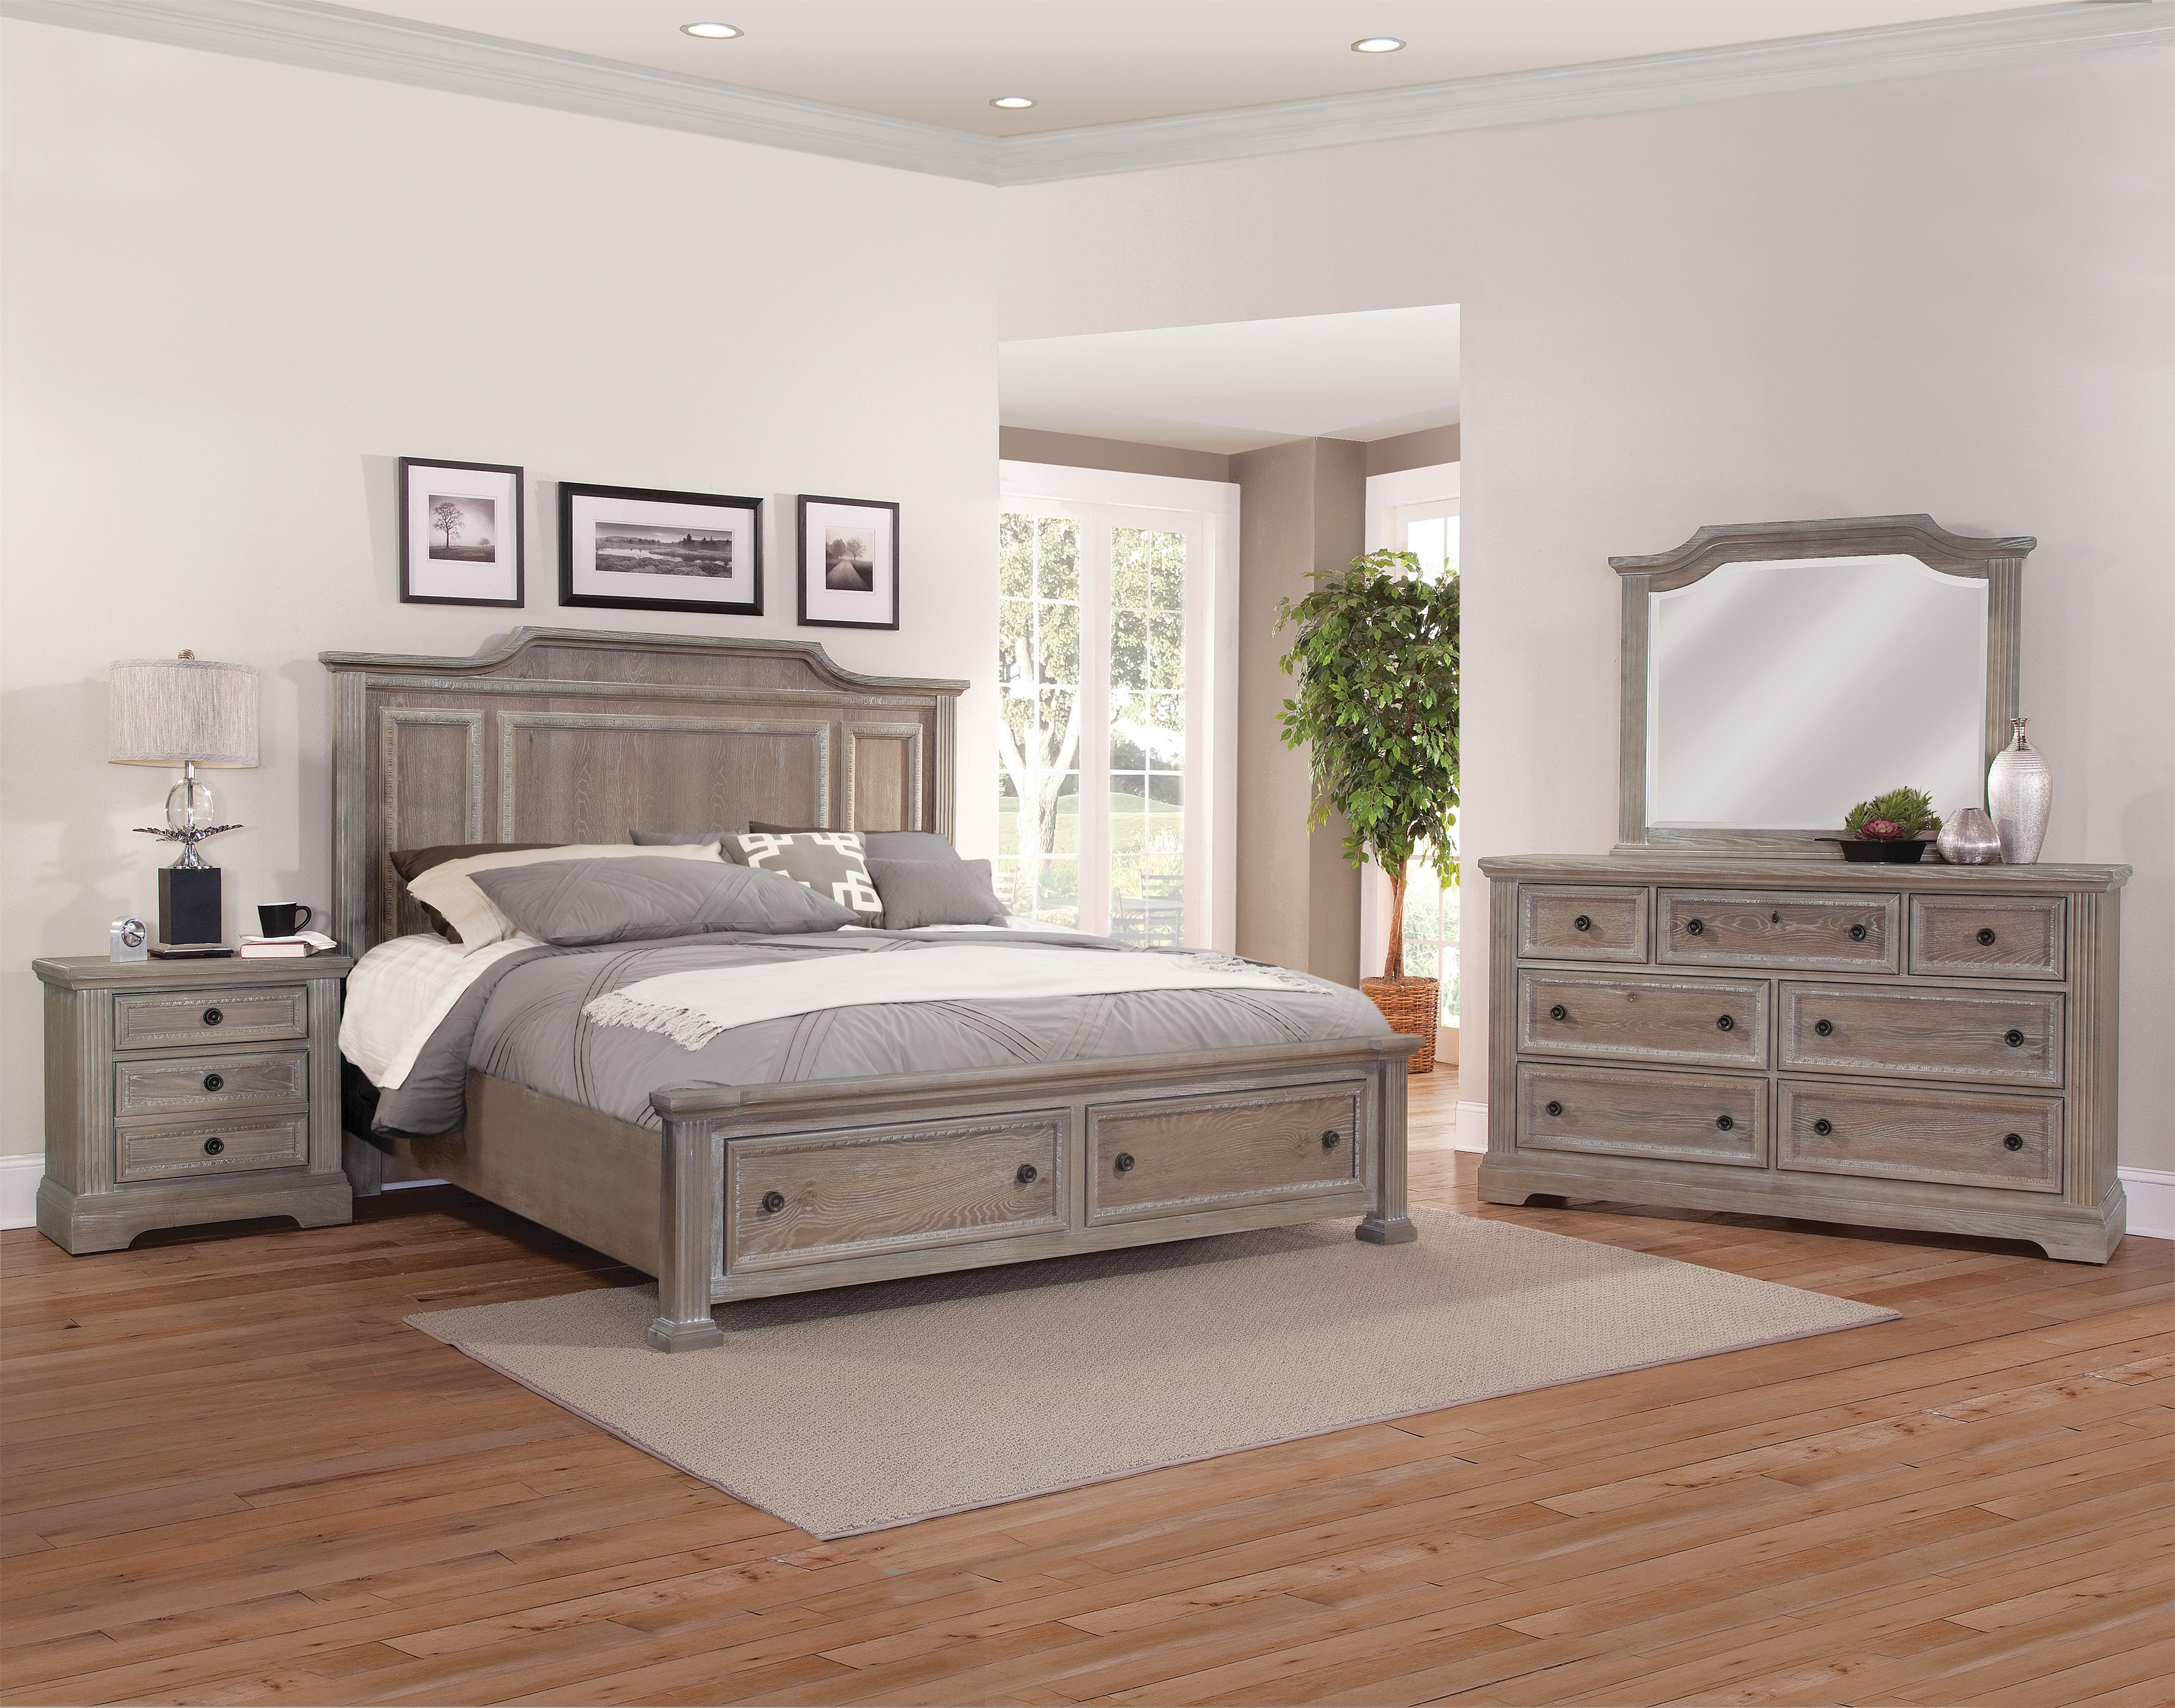 Vaughan Bassett Affinity King Bedroom Group - Item Number: 564 K Bedroom Group 3